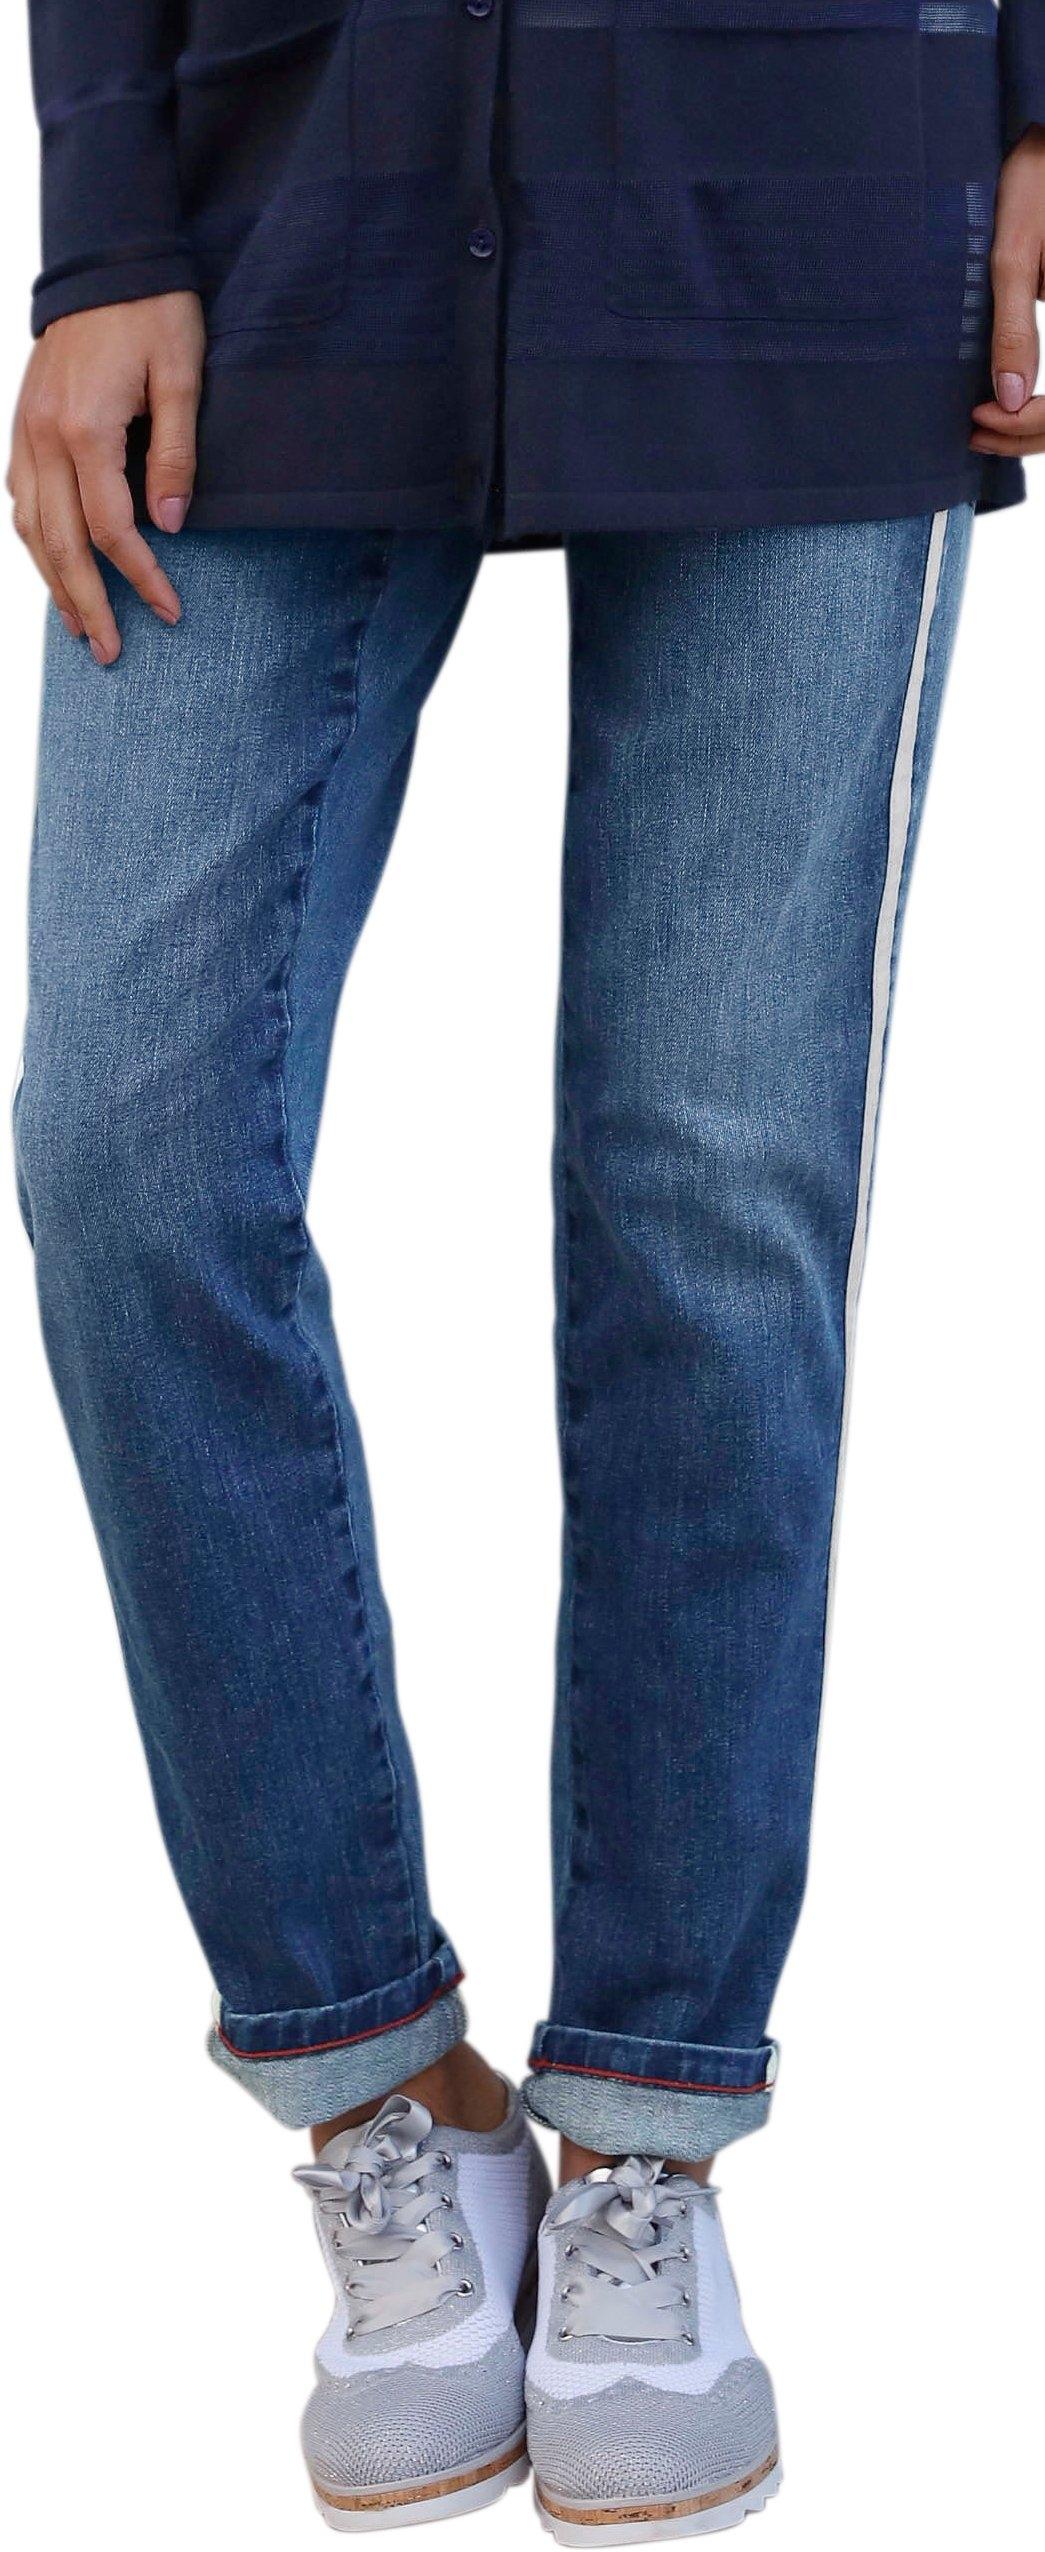 Création L jeans met vlotte glinsterstrepen goedkoop op otto.nl kopen